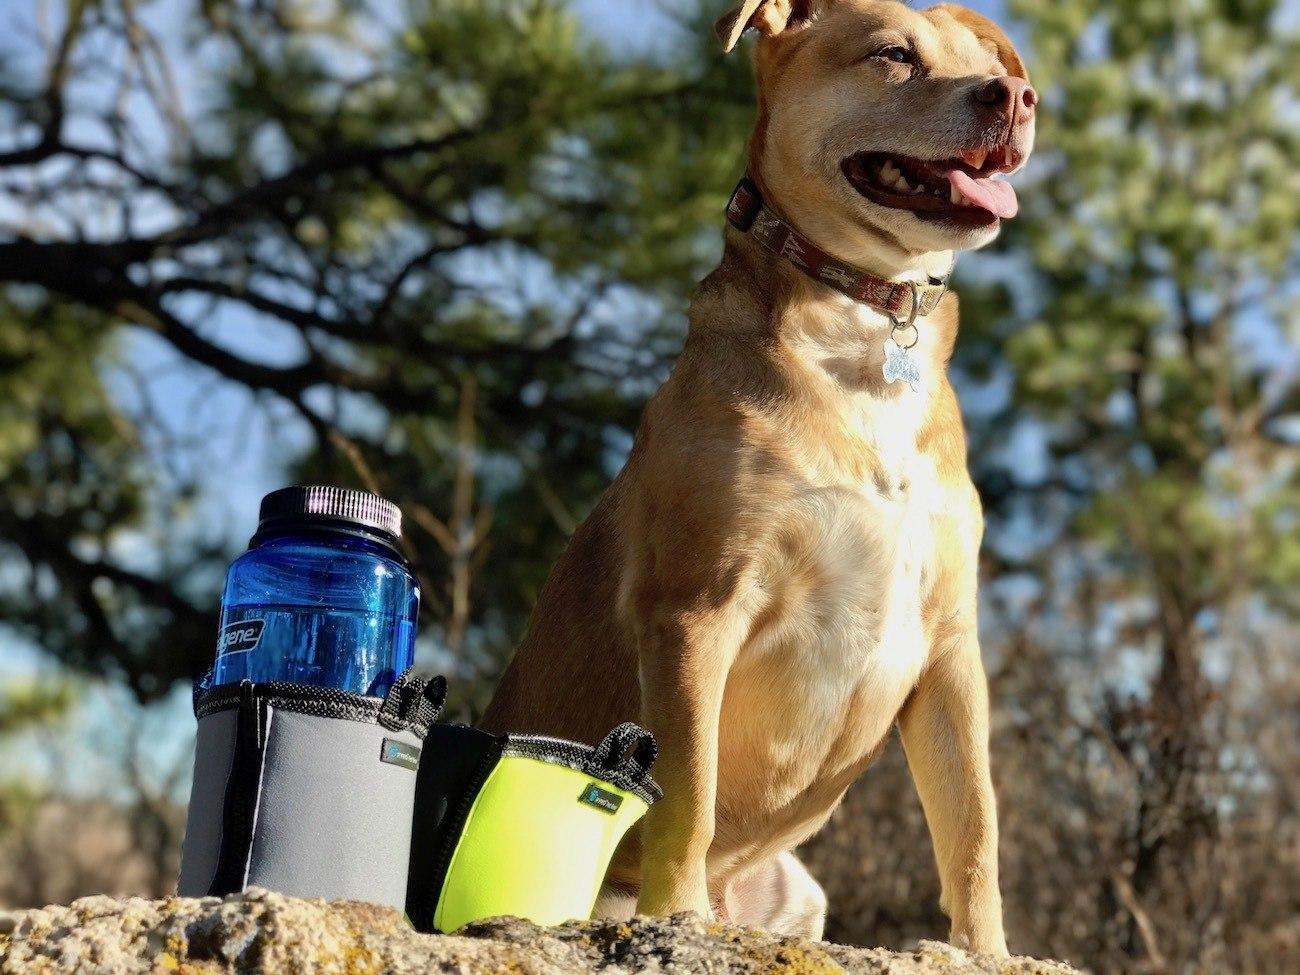 PaxBowl Portable Insulating Dog Bowl